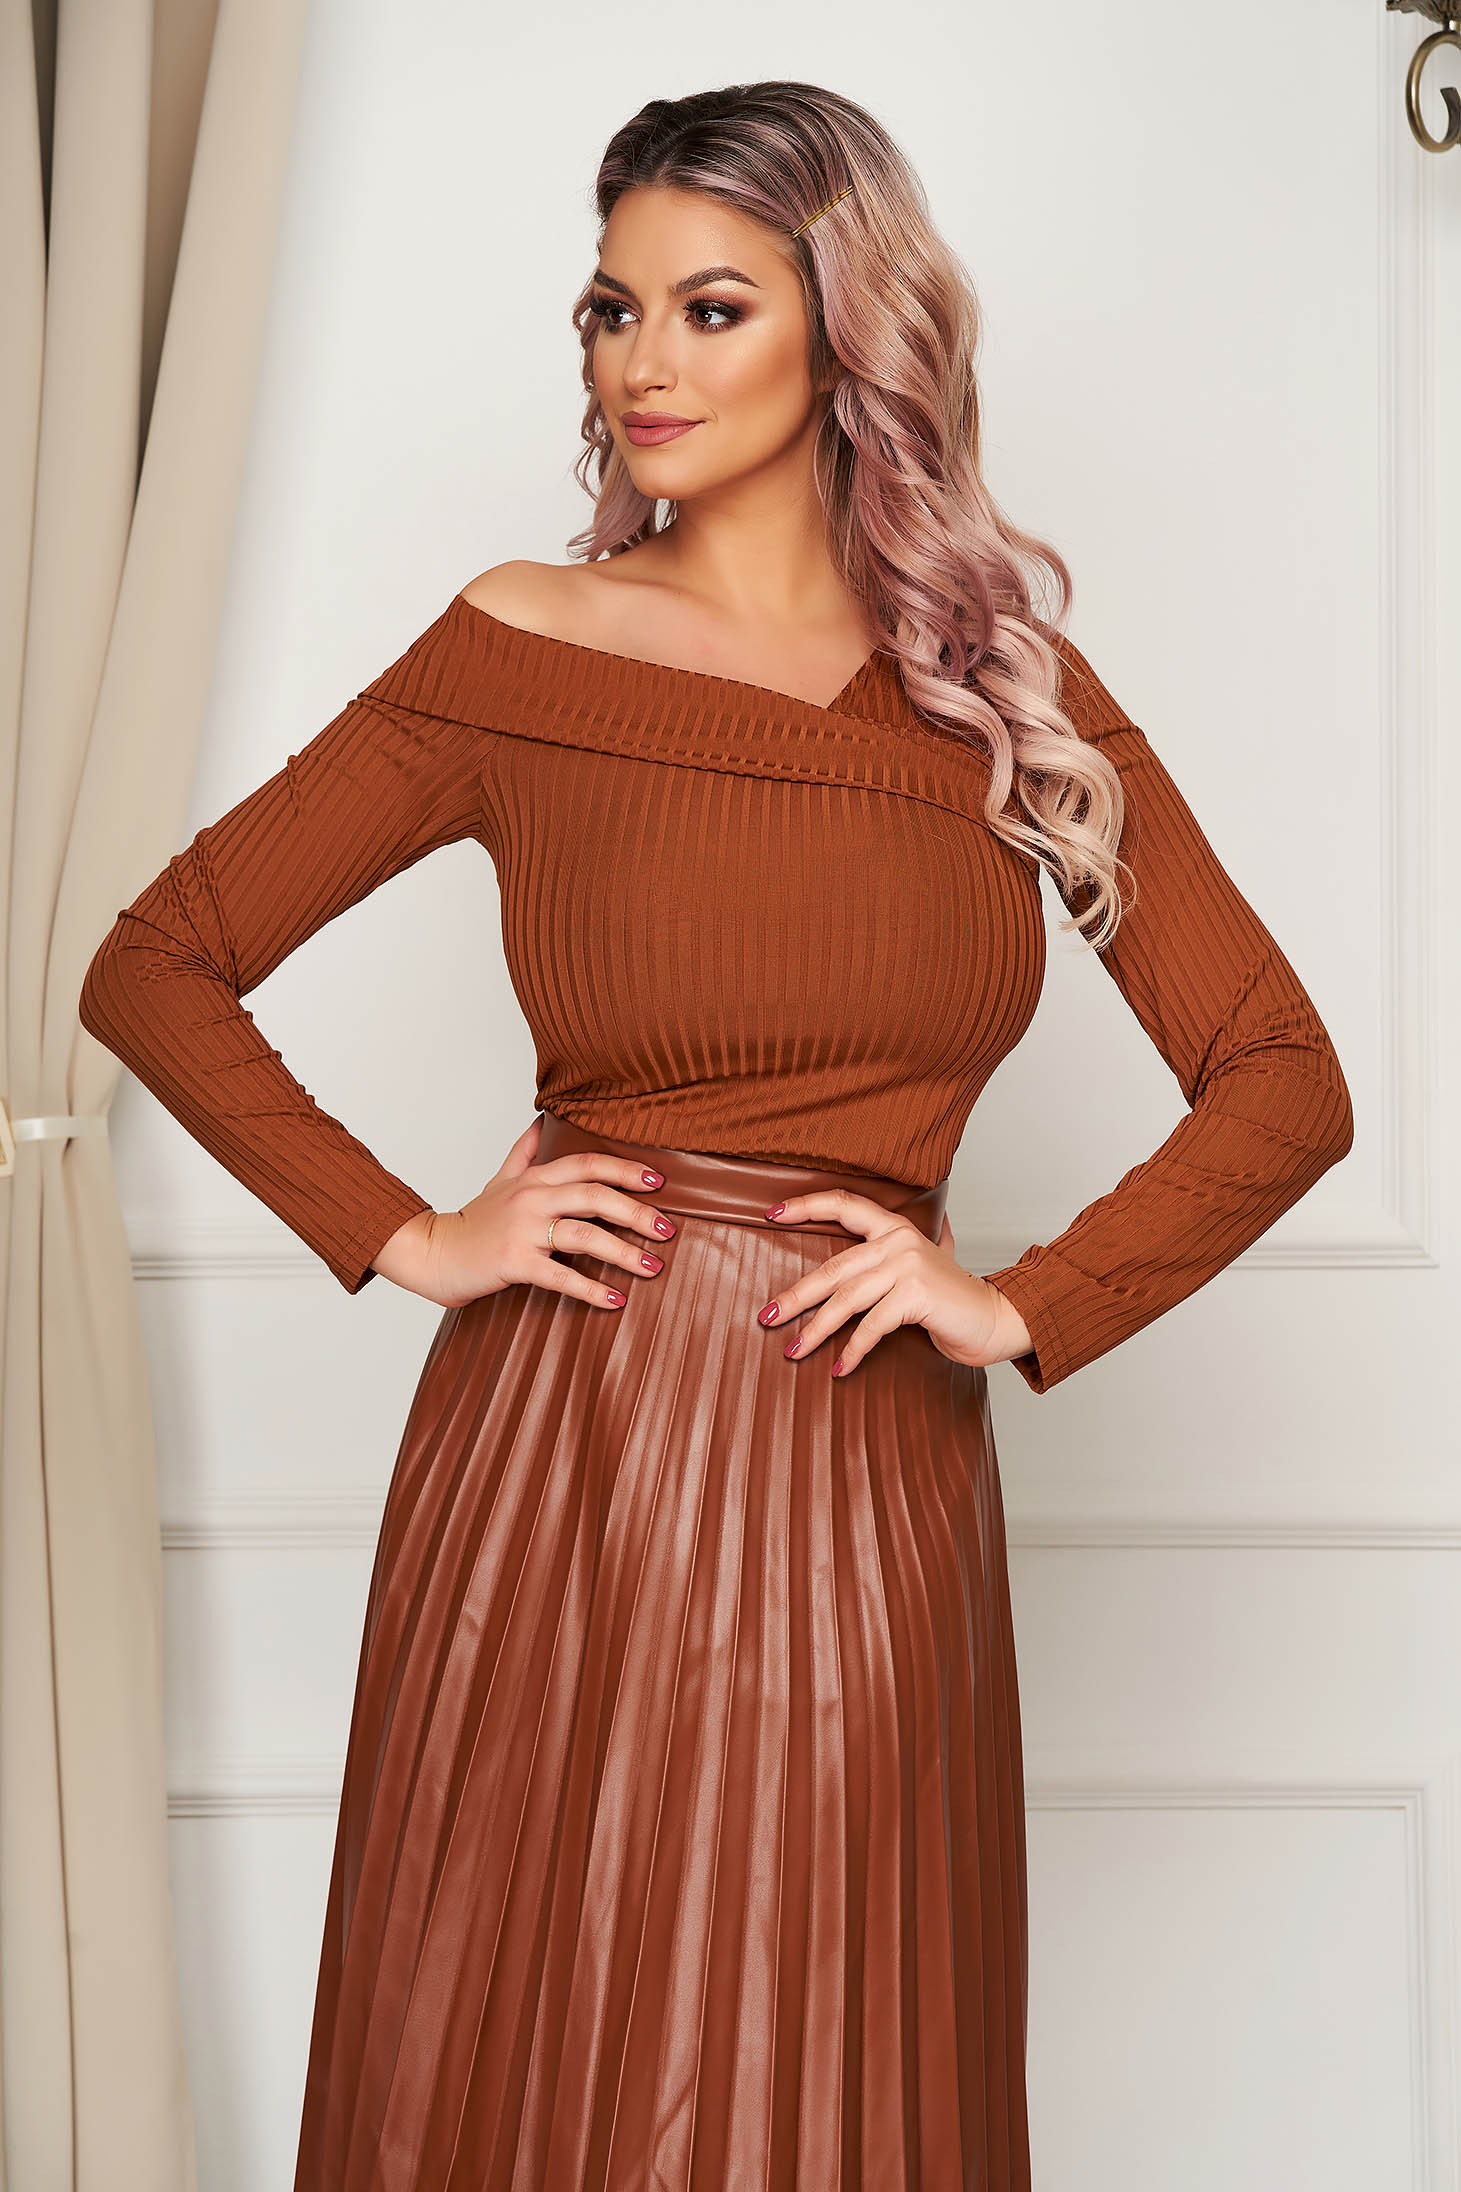 Casual barna női blúz szűk szabású